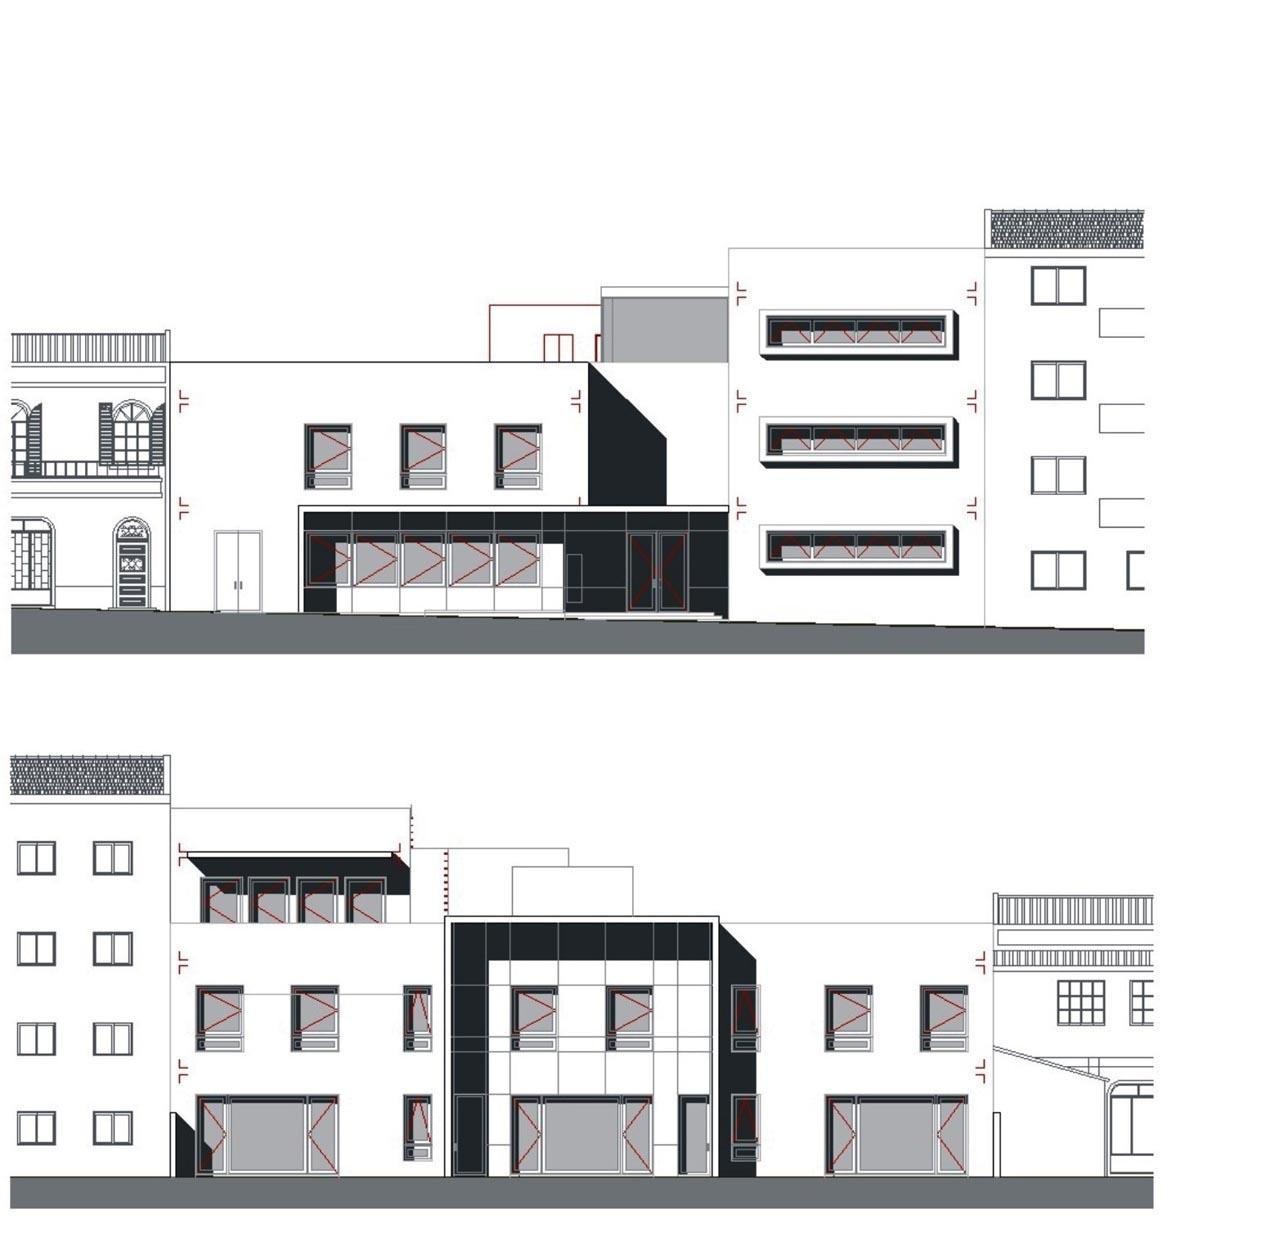 https://www.araujo-arquitectura.pt/wp-content/uploads/2020/12/Alcados.jpg